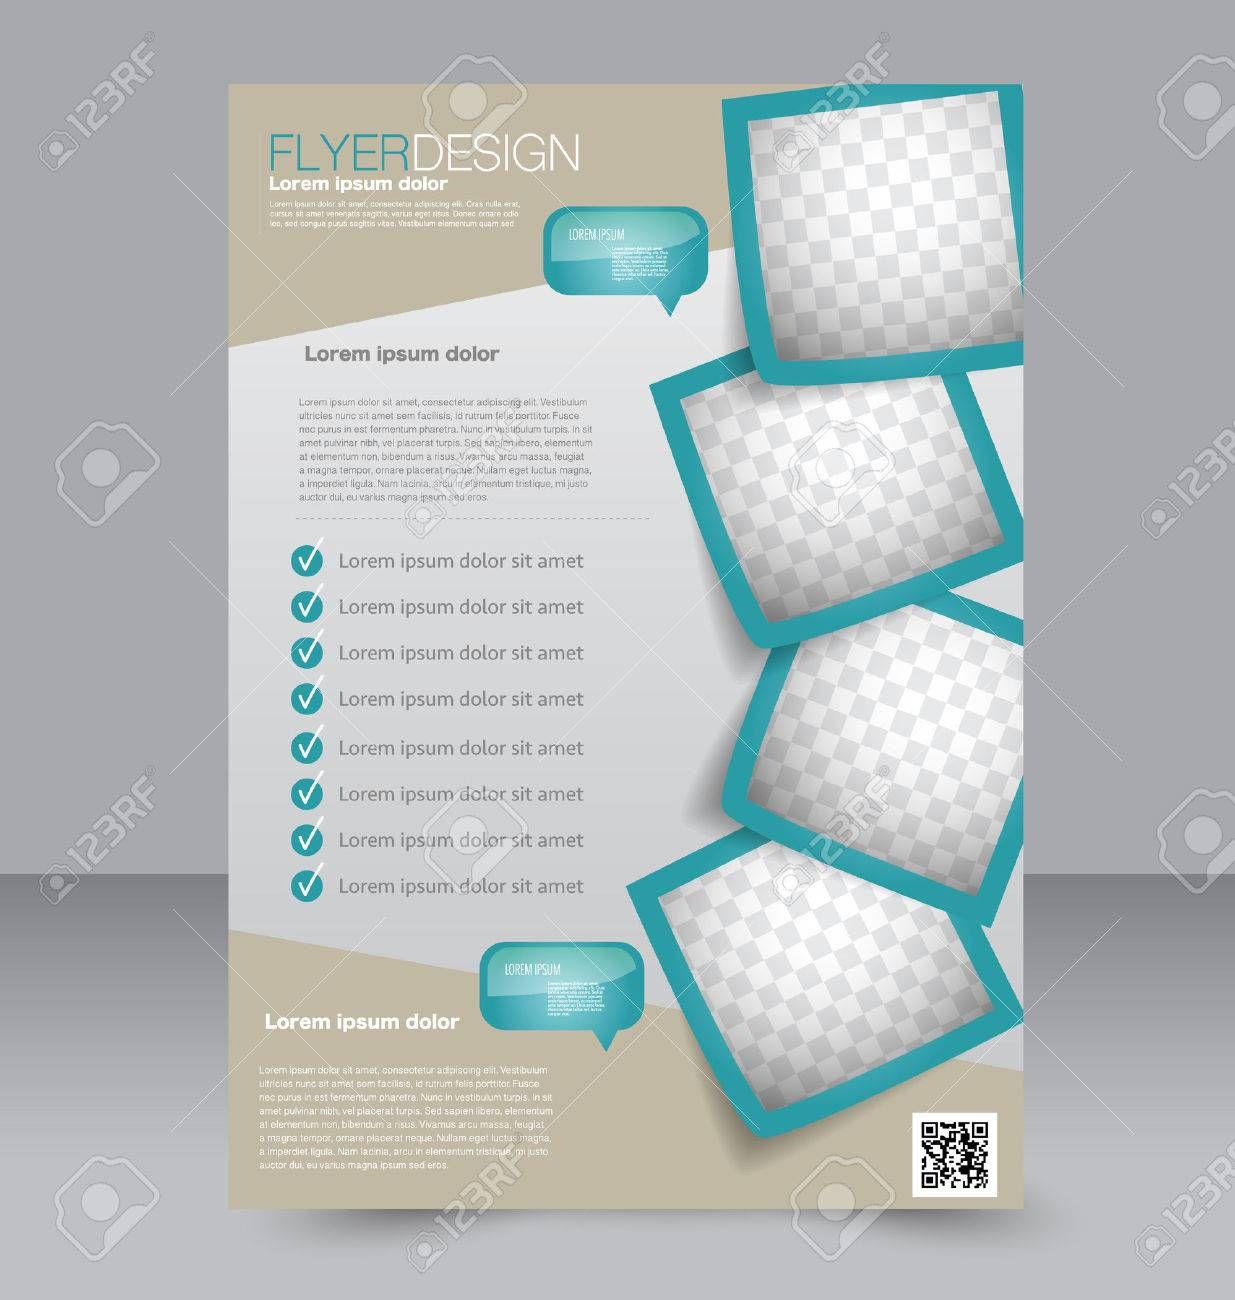 005 Beautiful Free Editable Flyer Template Example  Busines FundraisingFull